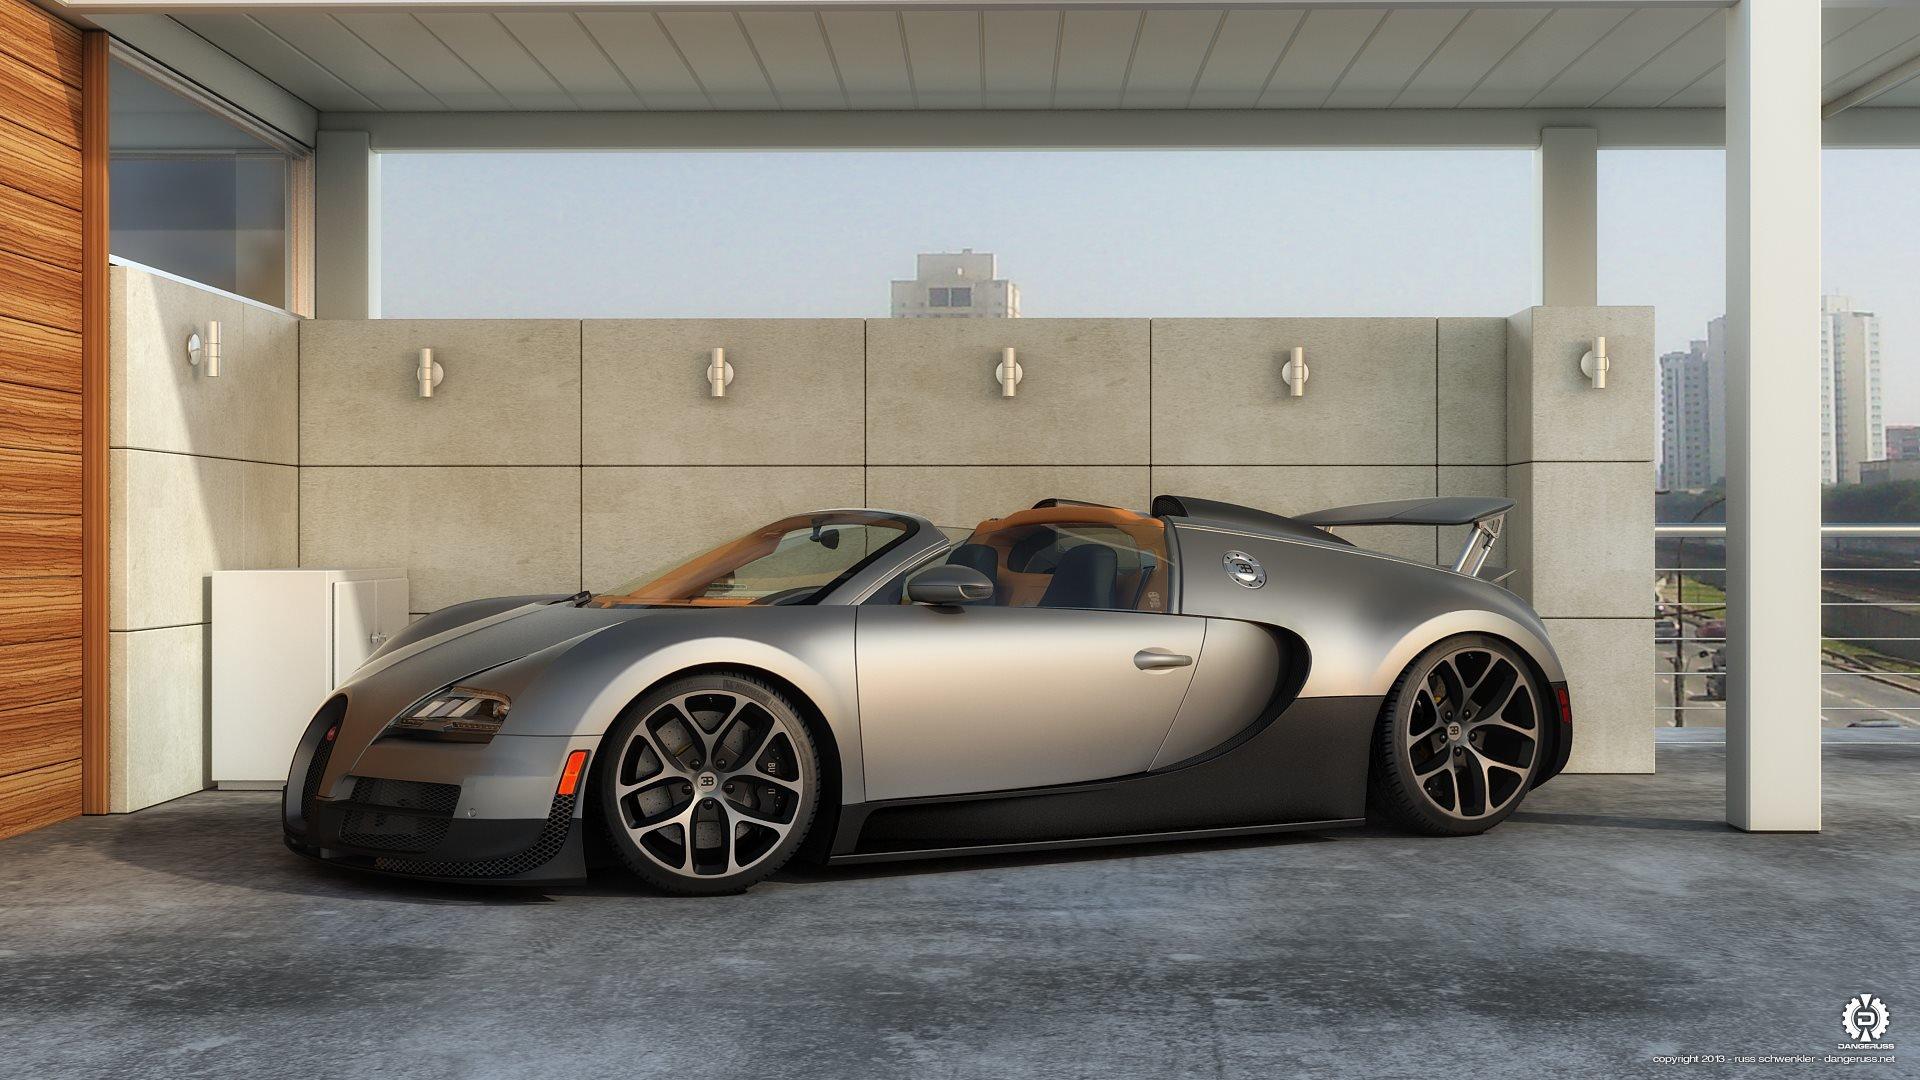 ... Bugatti Neon Rainbow On Neon Dodge, Neon Acr, Neon Underglow For  Trucks, ...